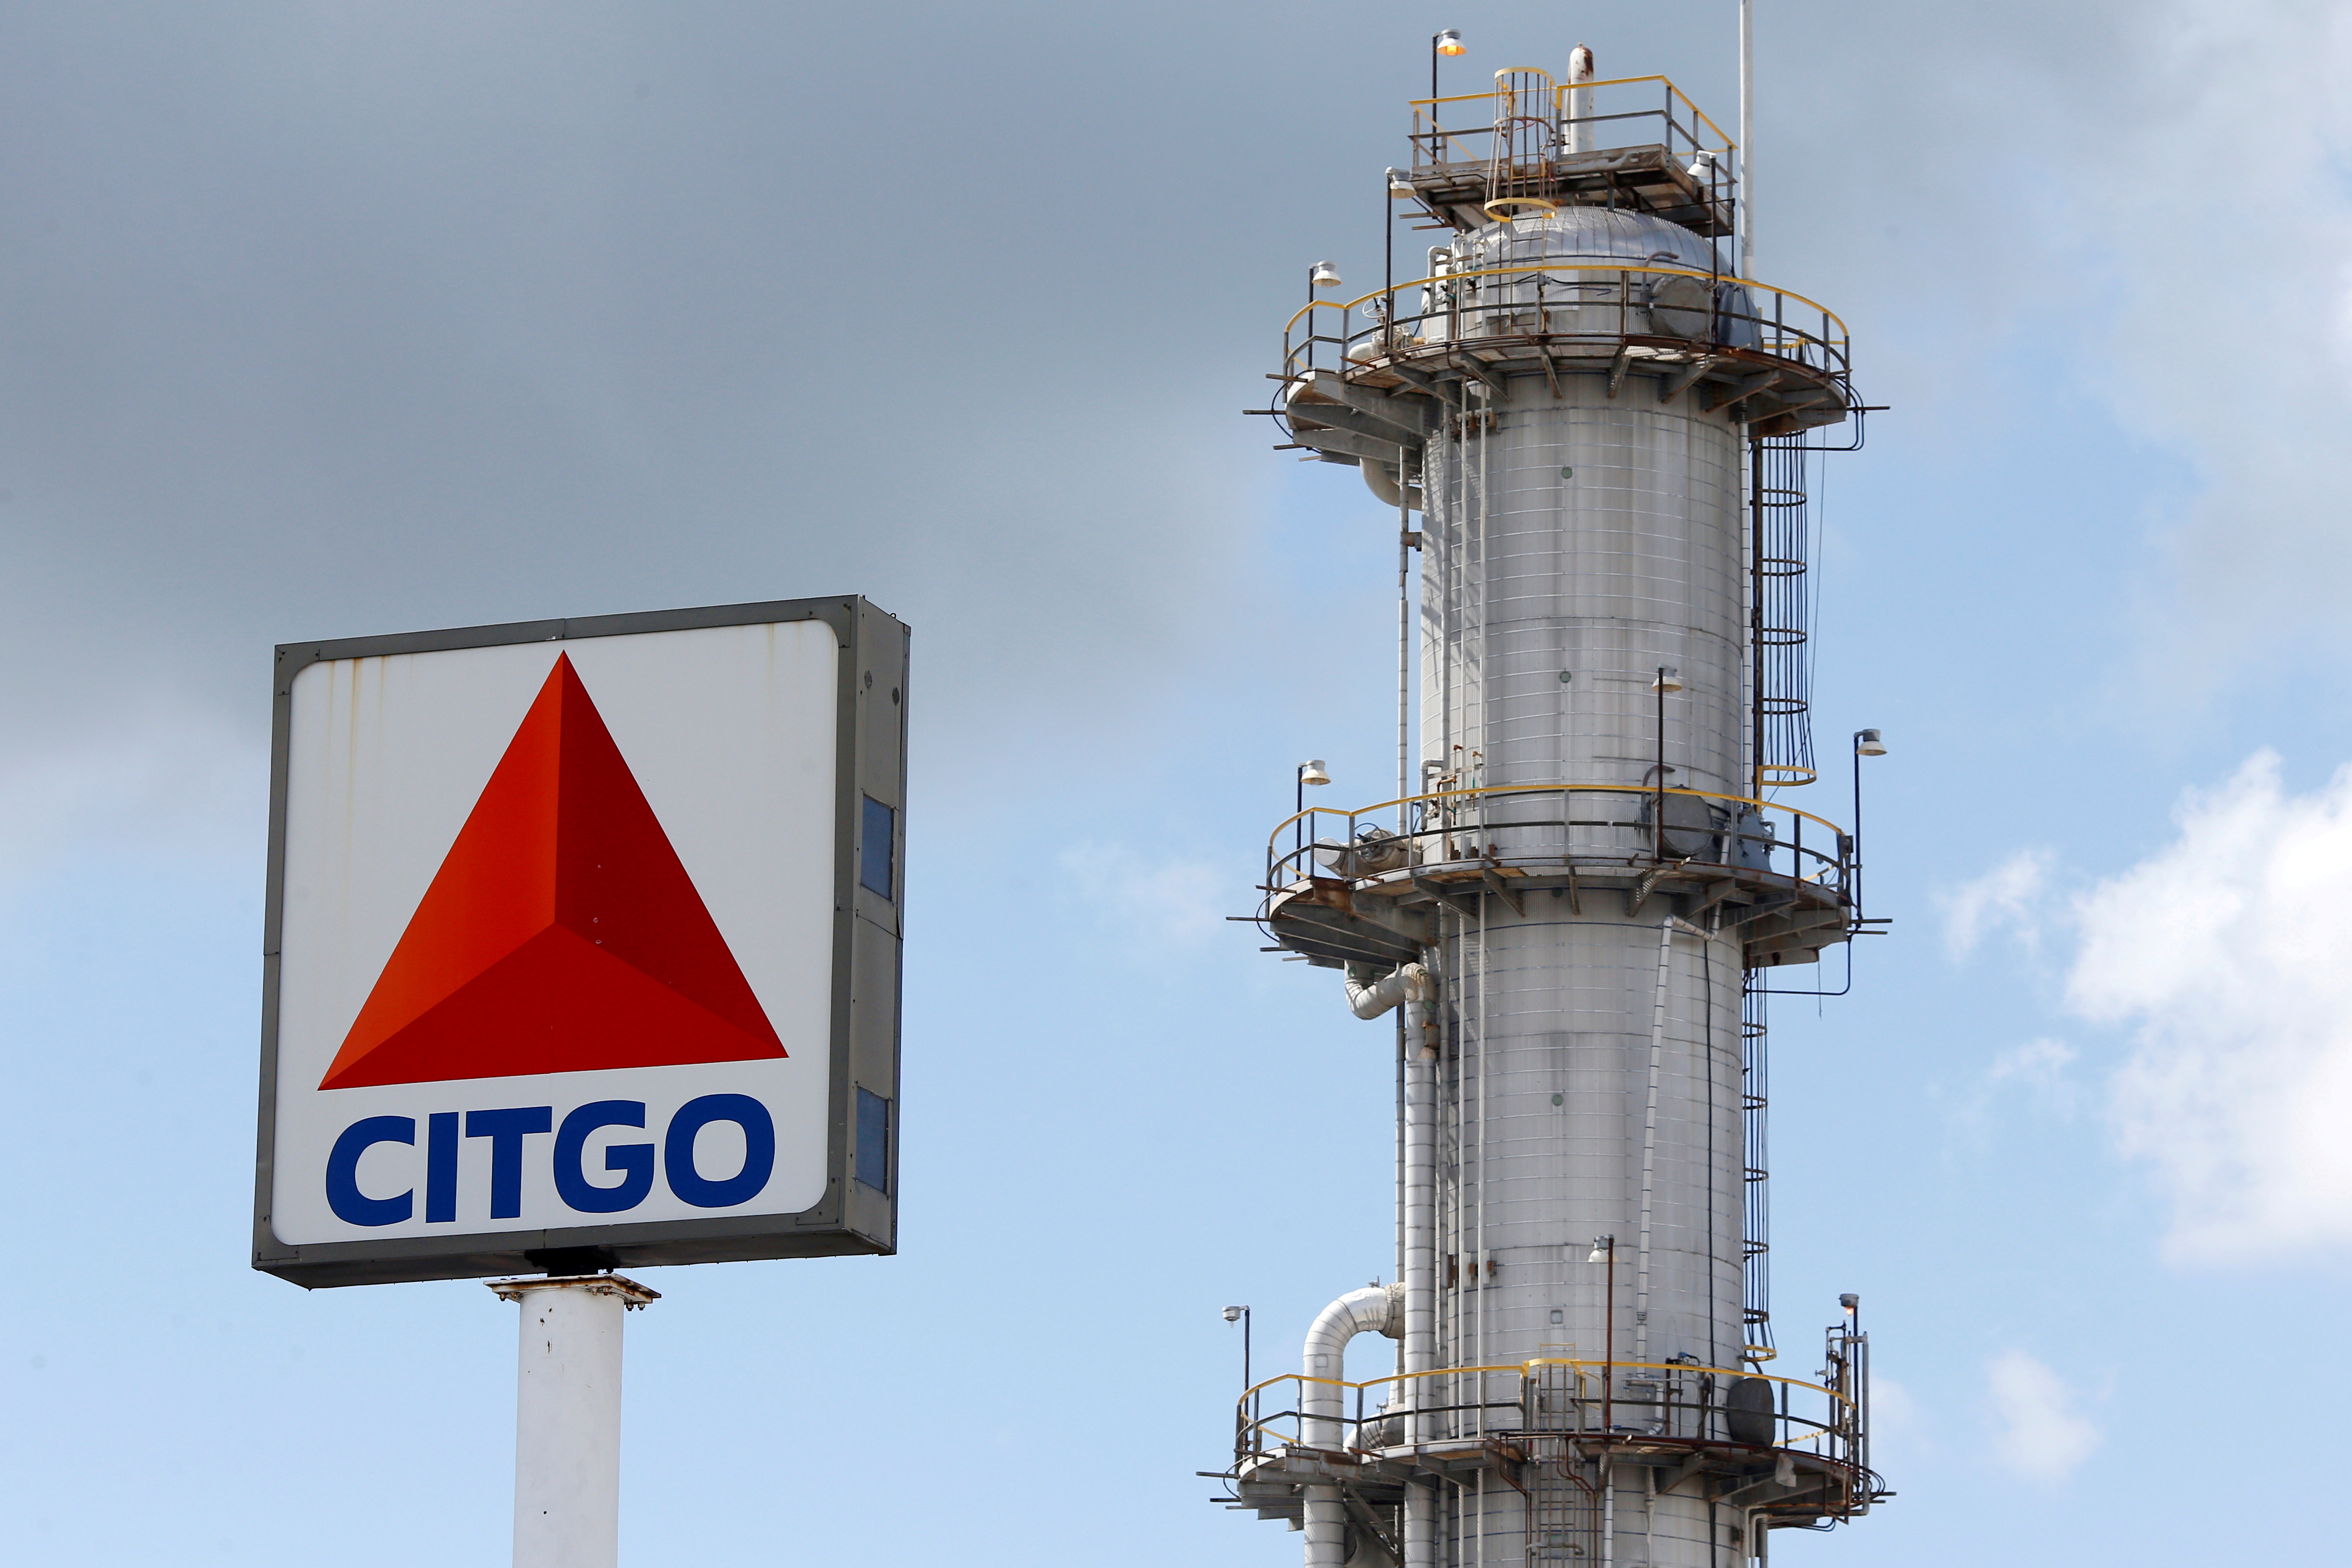 Citgo Petroleum refinery is pictured in Sulphur, Louisiana, U.S., June 12, 2018. REUTERS/Jonathan Bachman